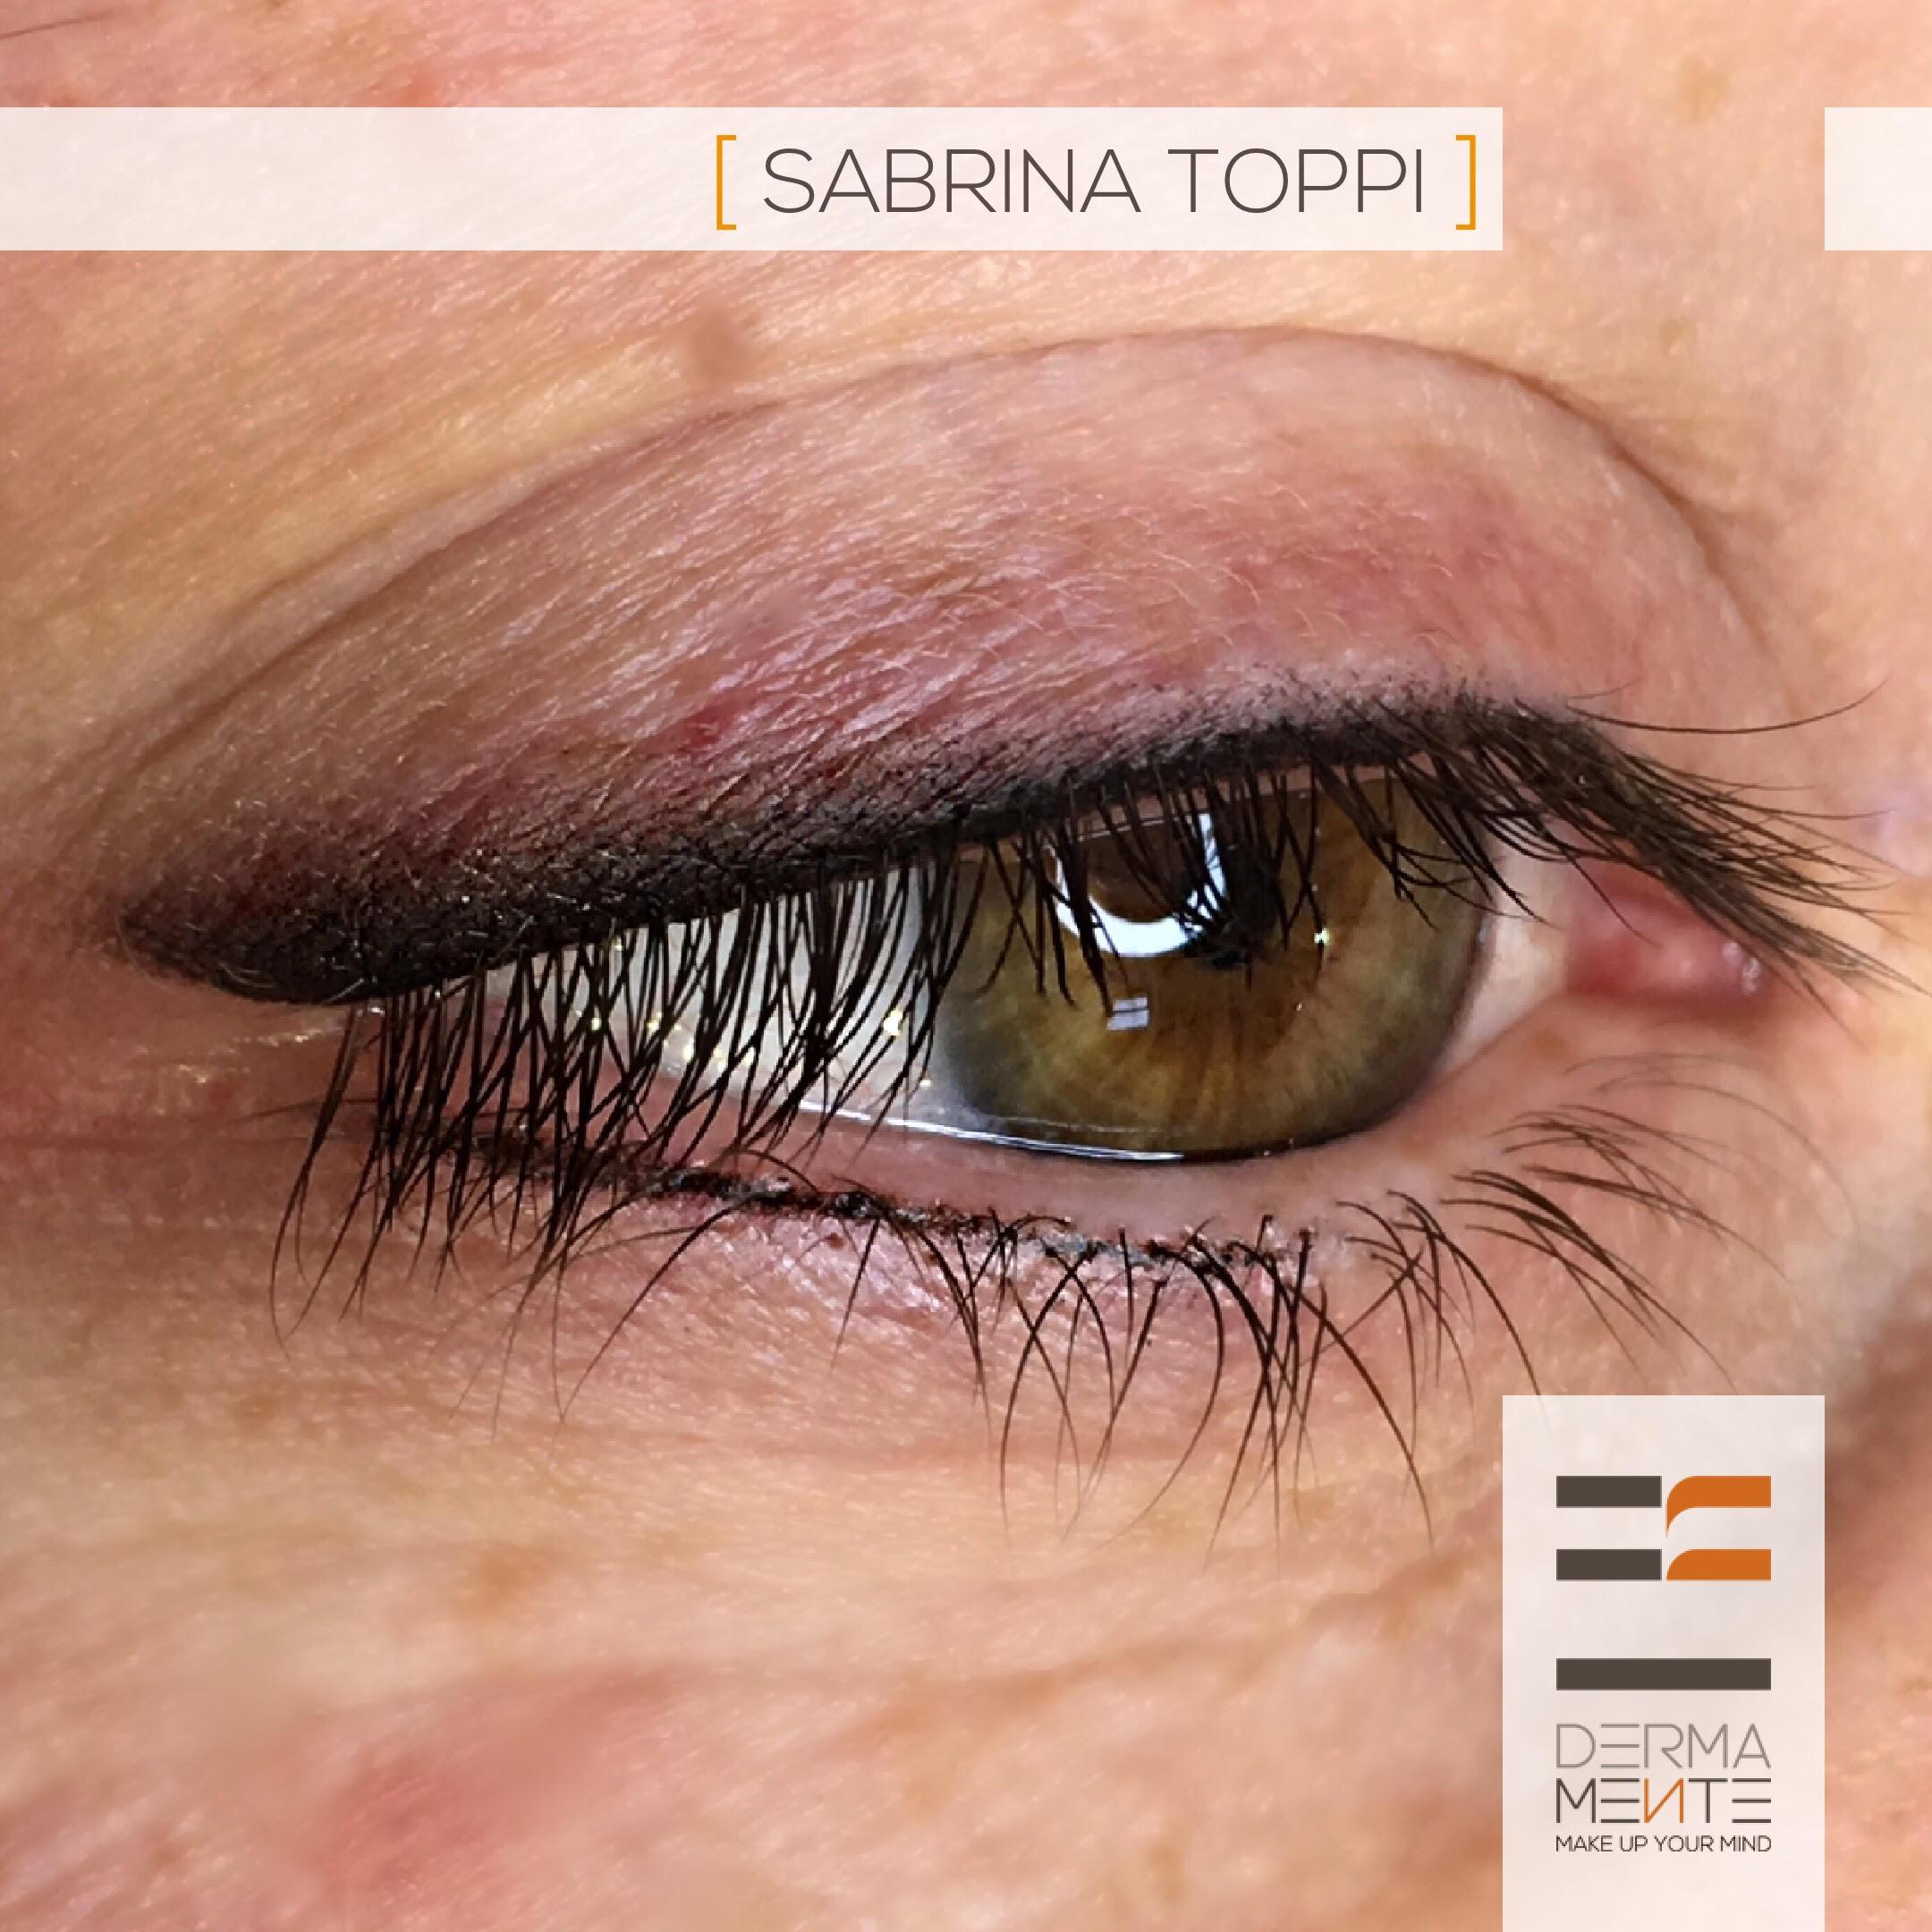 sabrina-toppi-7